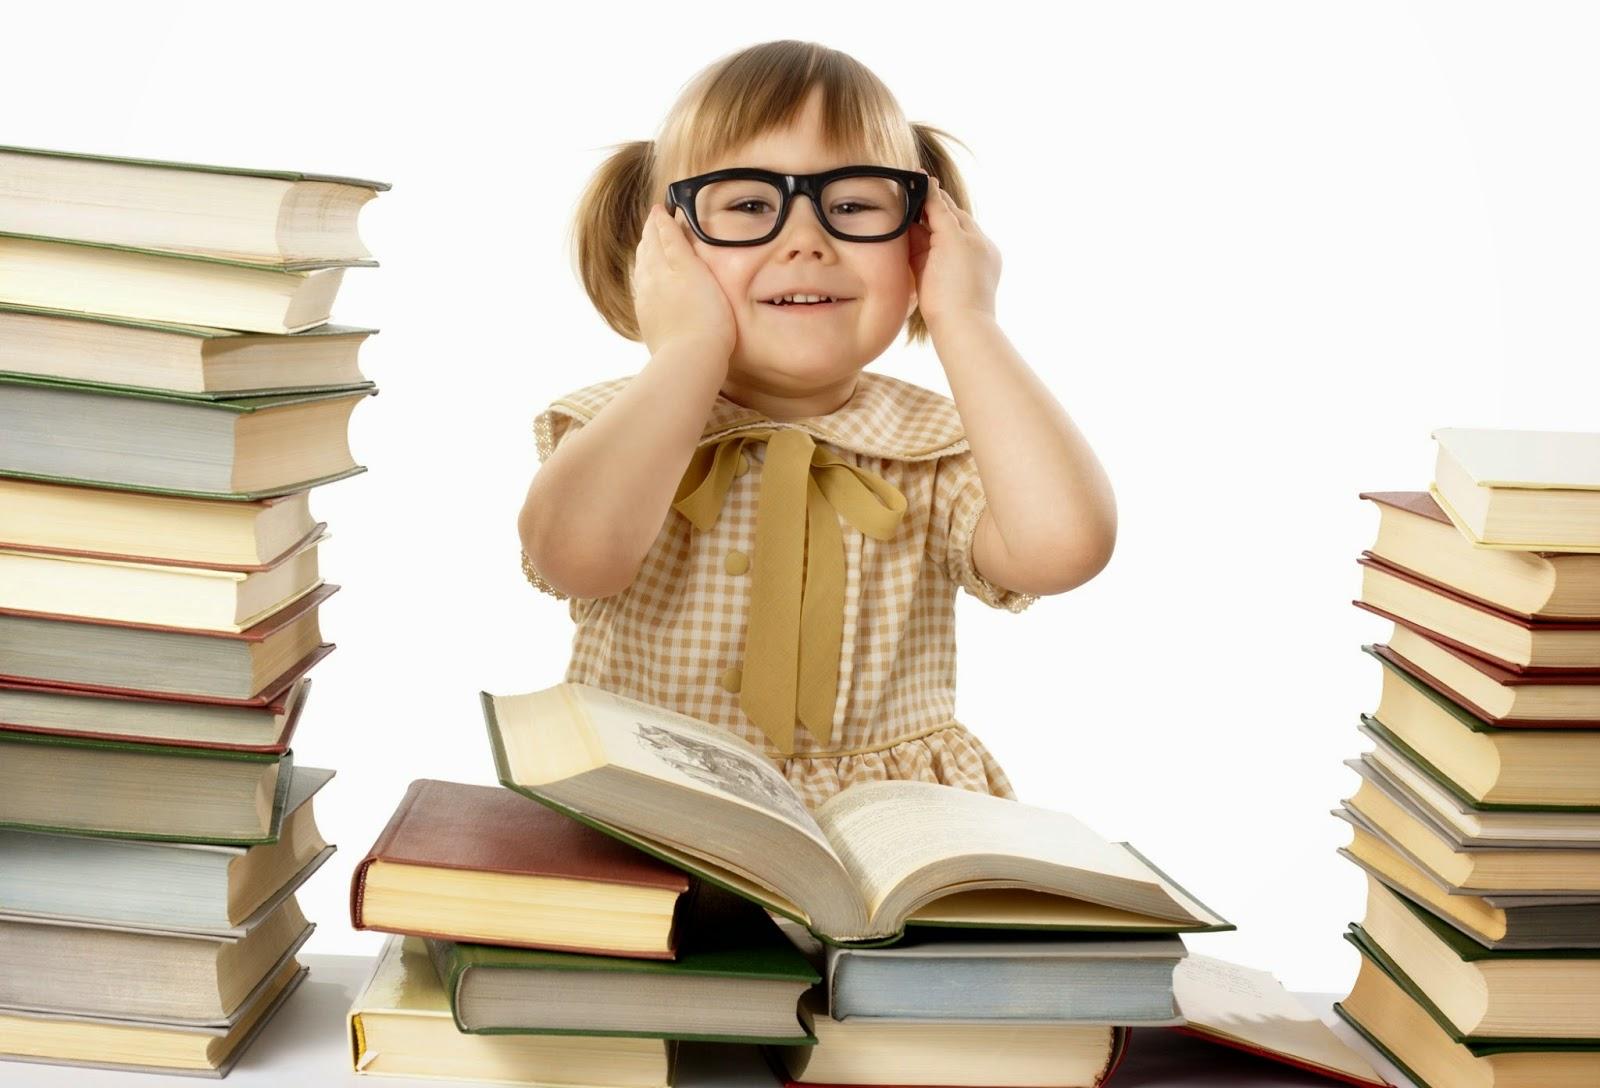 Foto anak kecil baca buku gratis